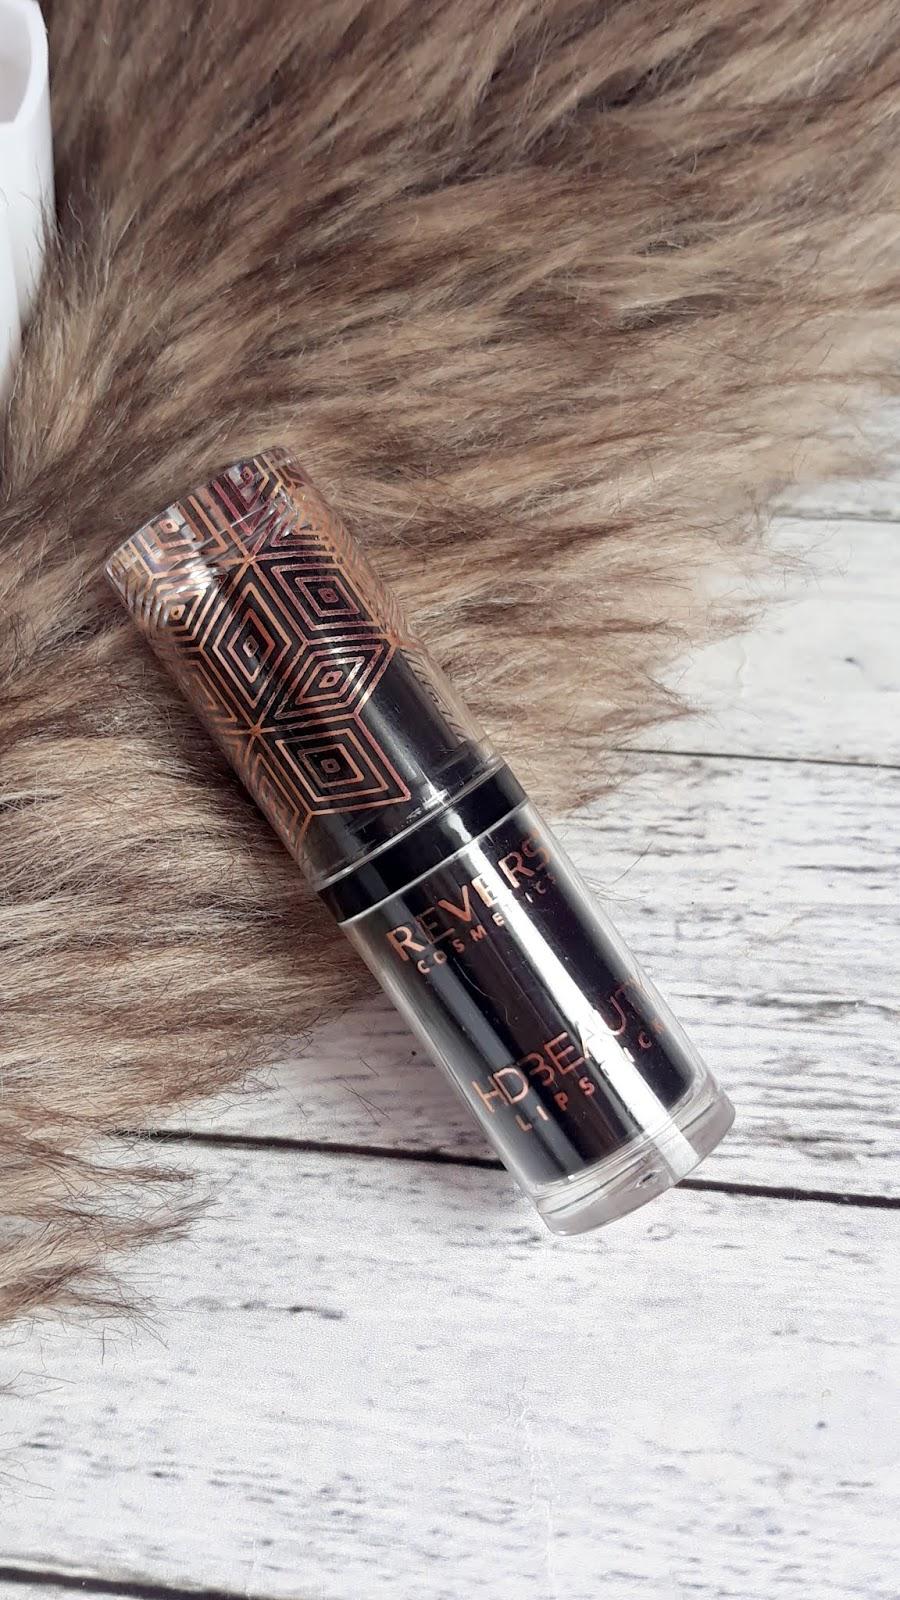 REVERS HD Beauty Lipstick pomadka Zoey